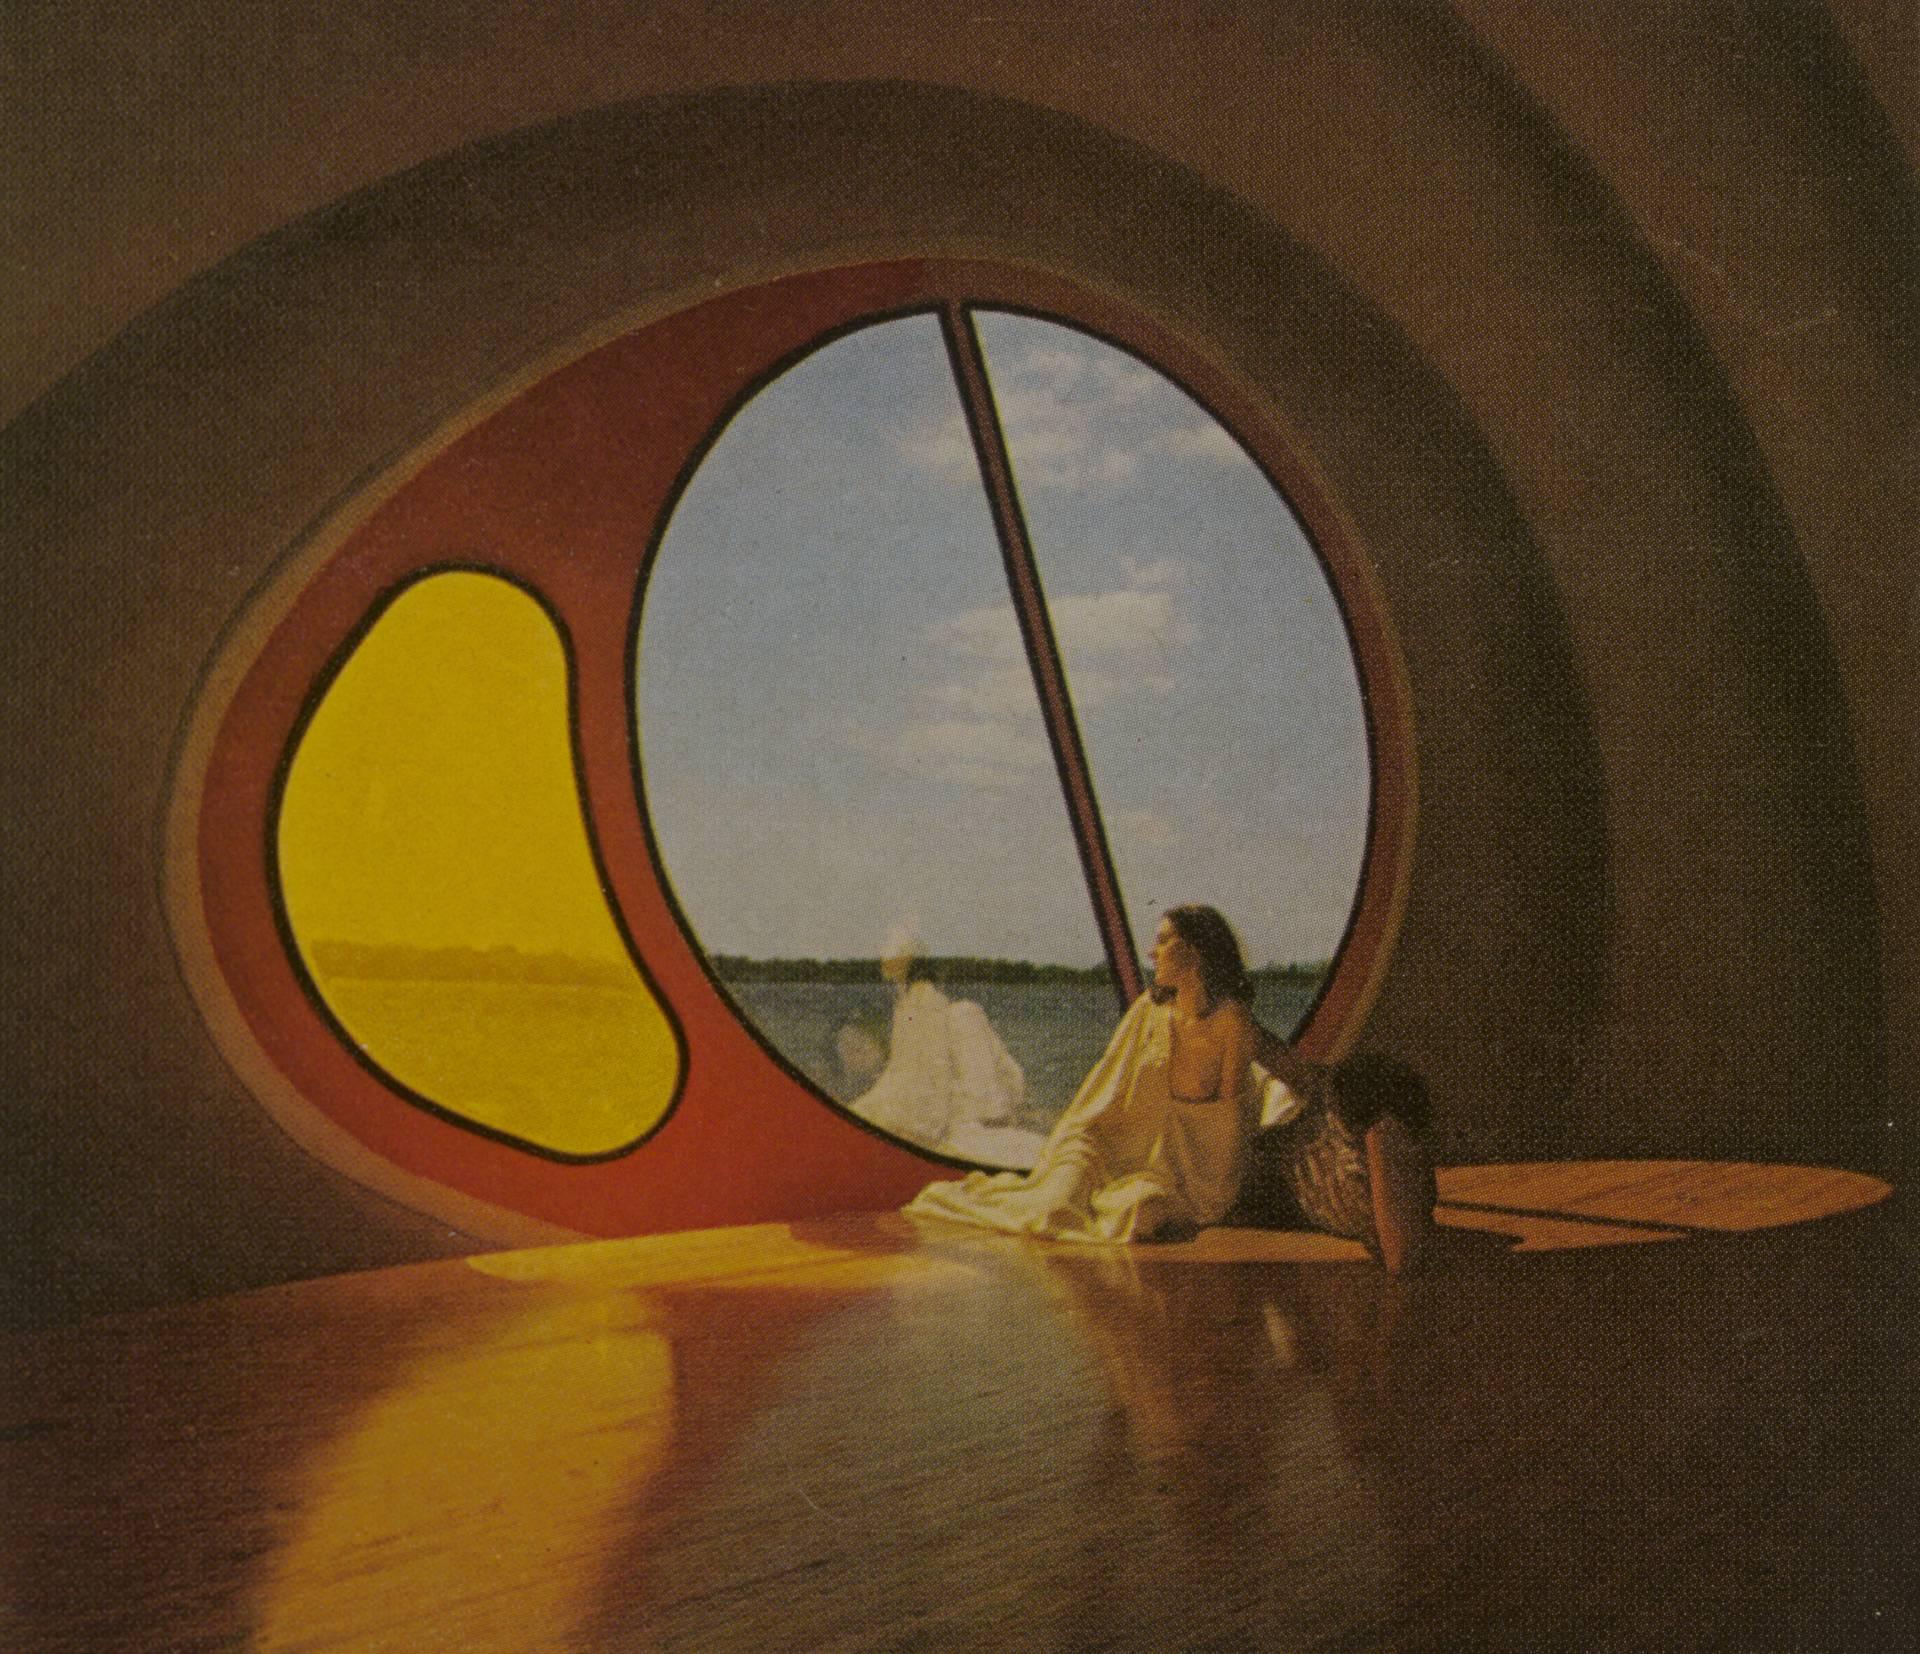 'La casa del siglo', de Ant Farm (Richard Jost, Chip Lord, Doug Michels). Publicado en la revista Playboy (1973).